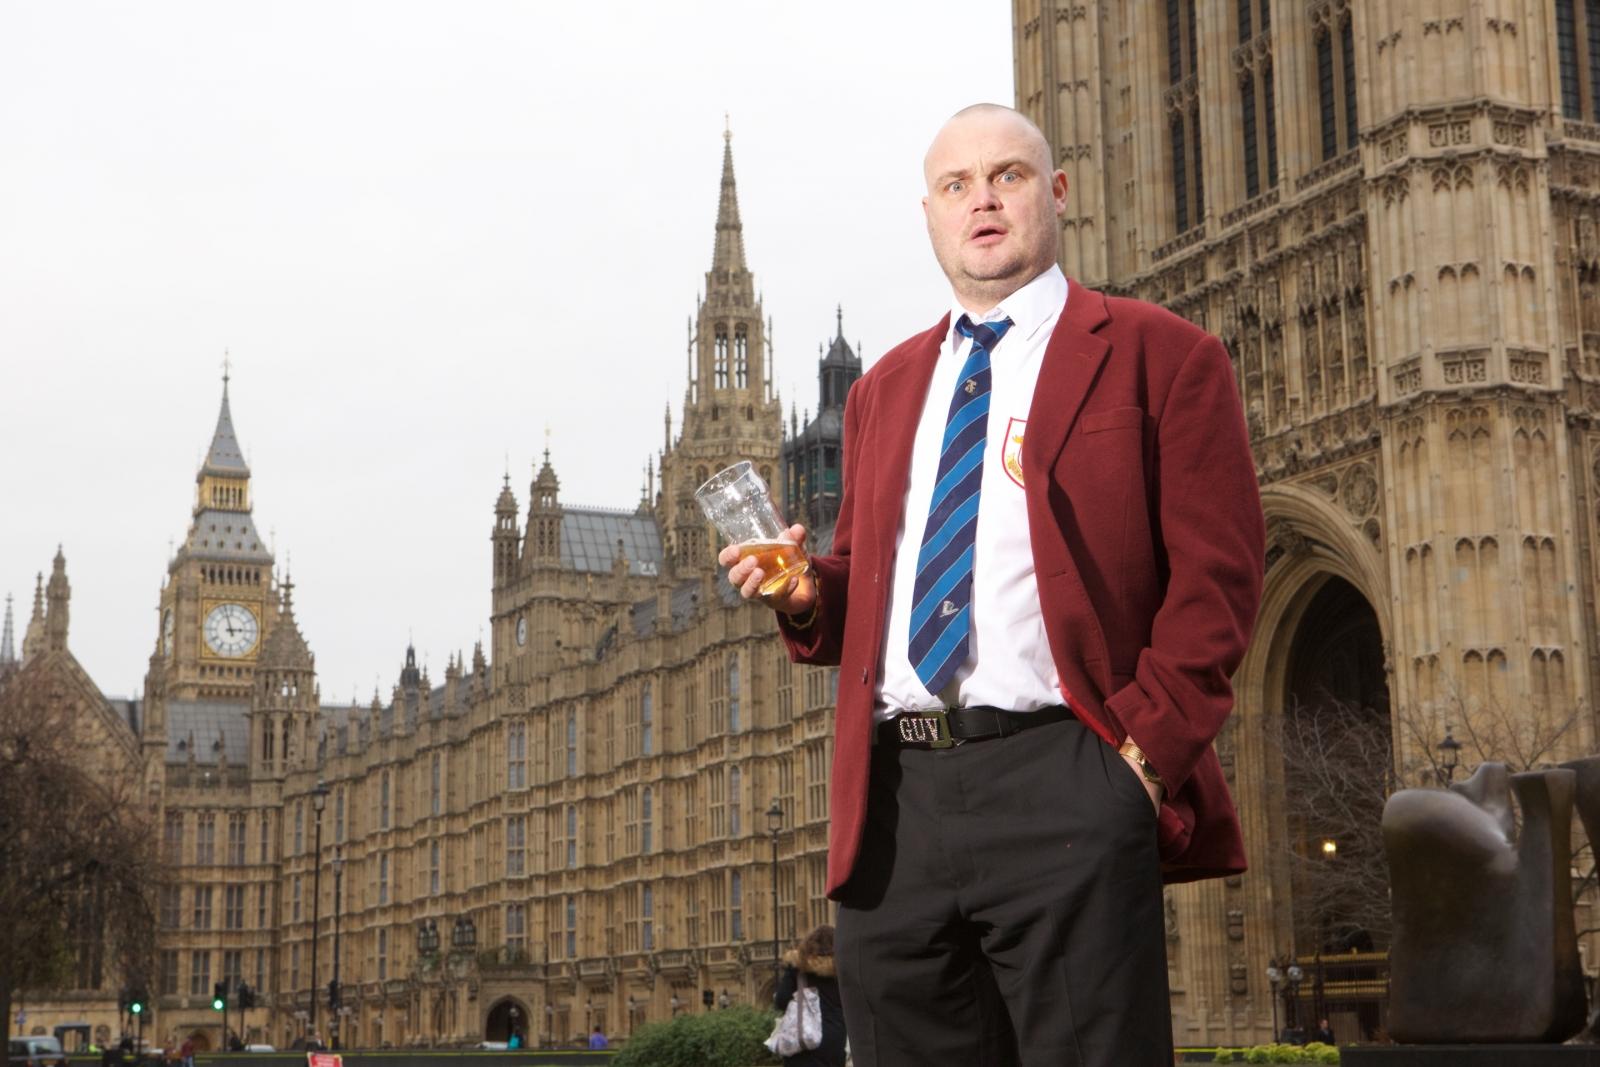 The Pub Landlord